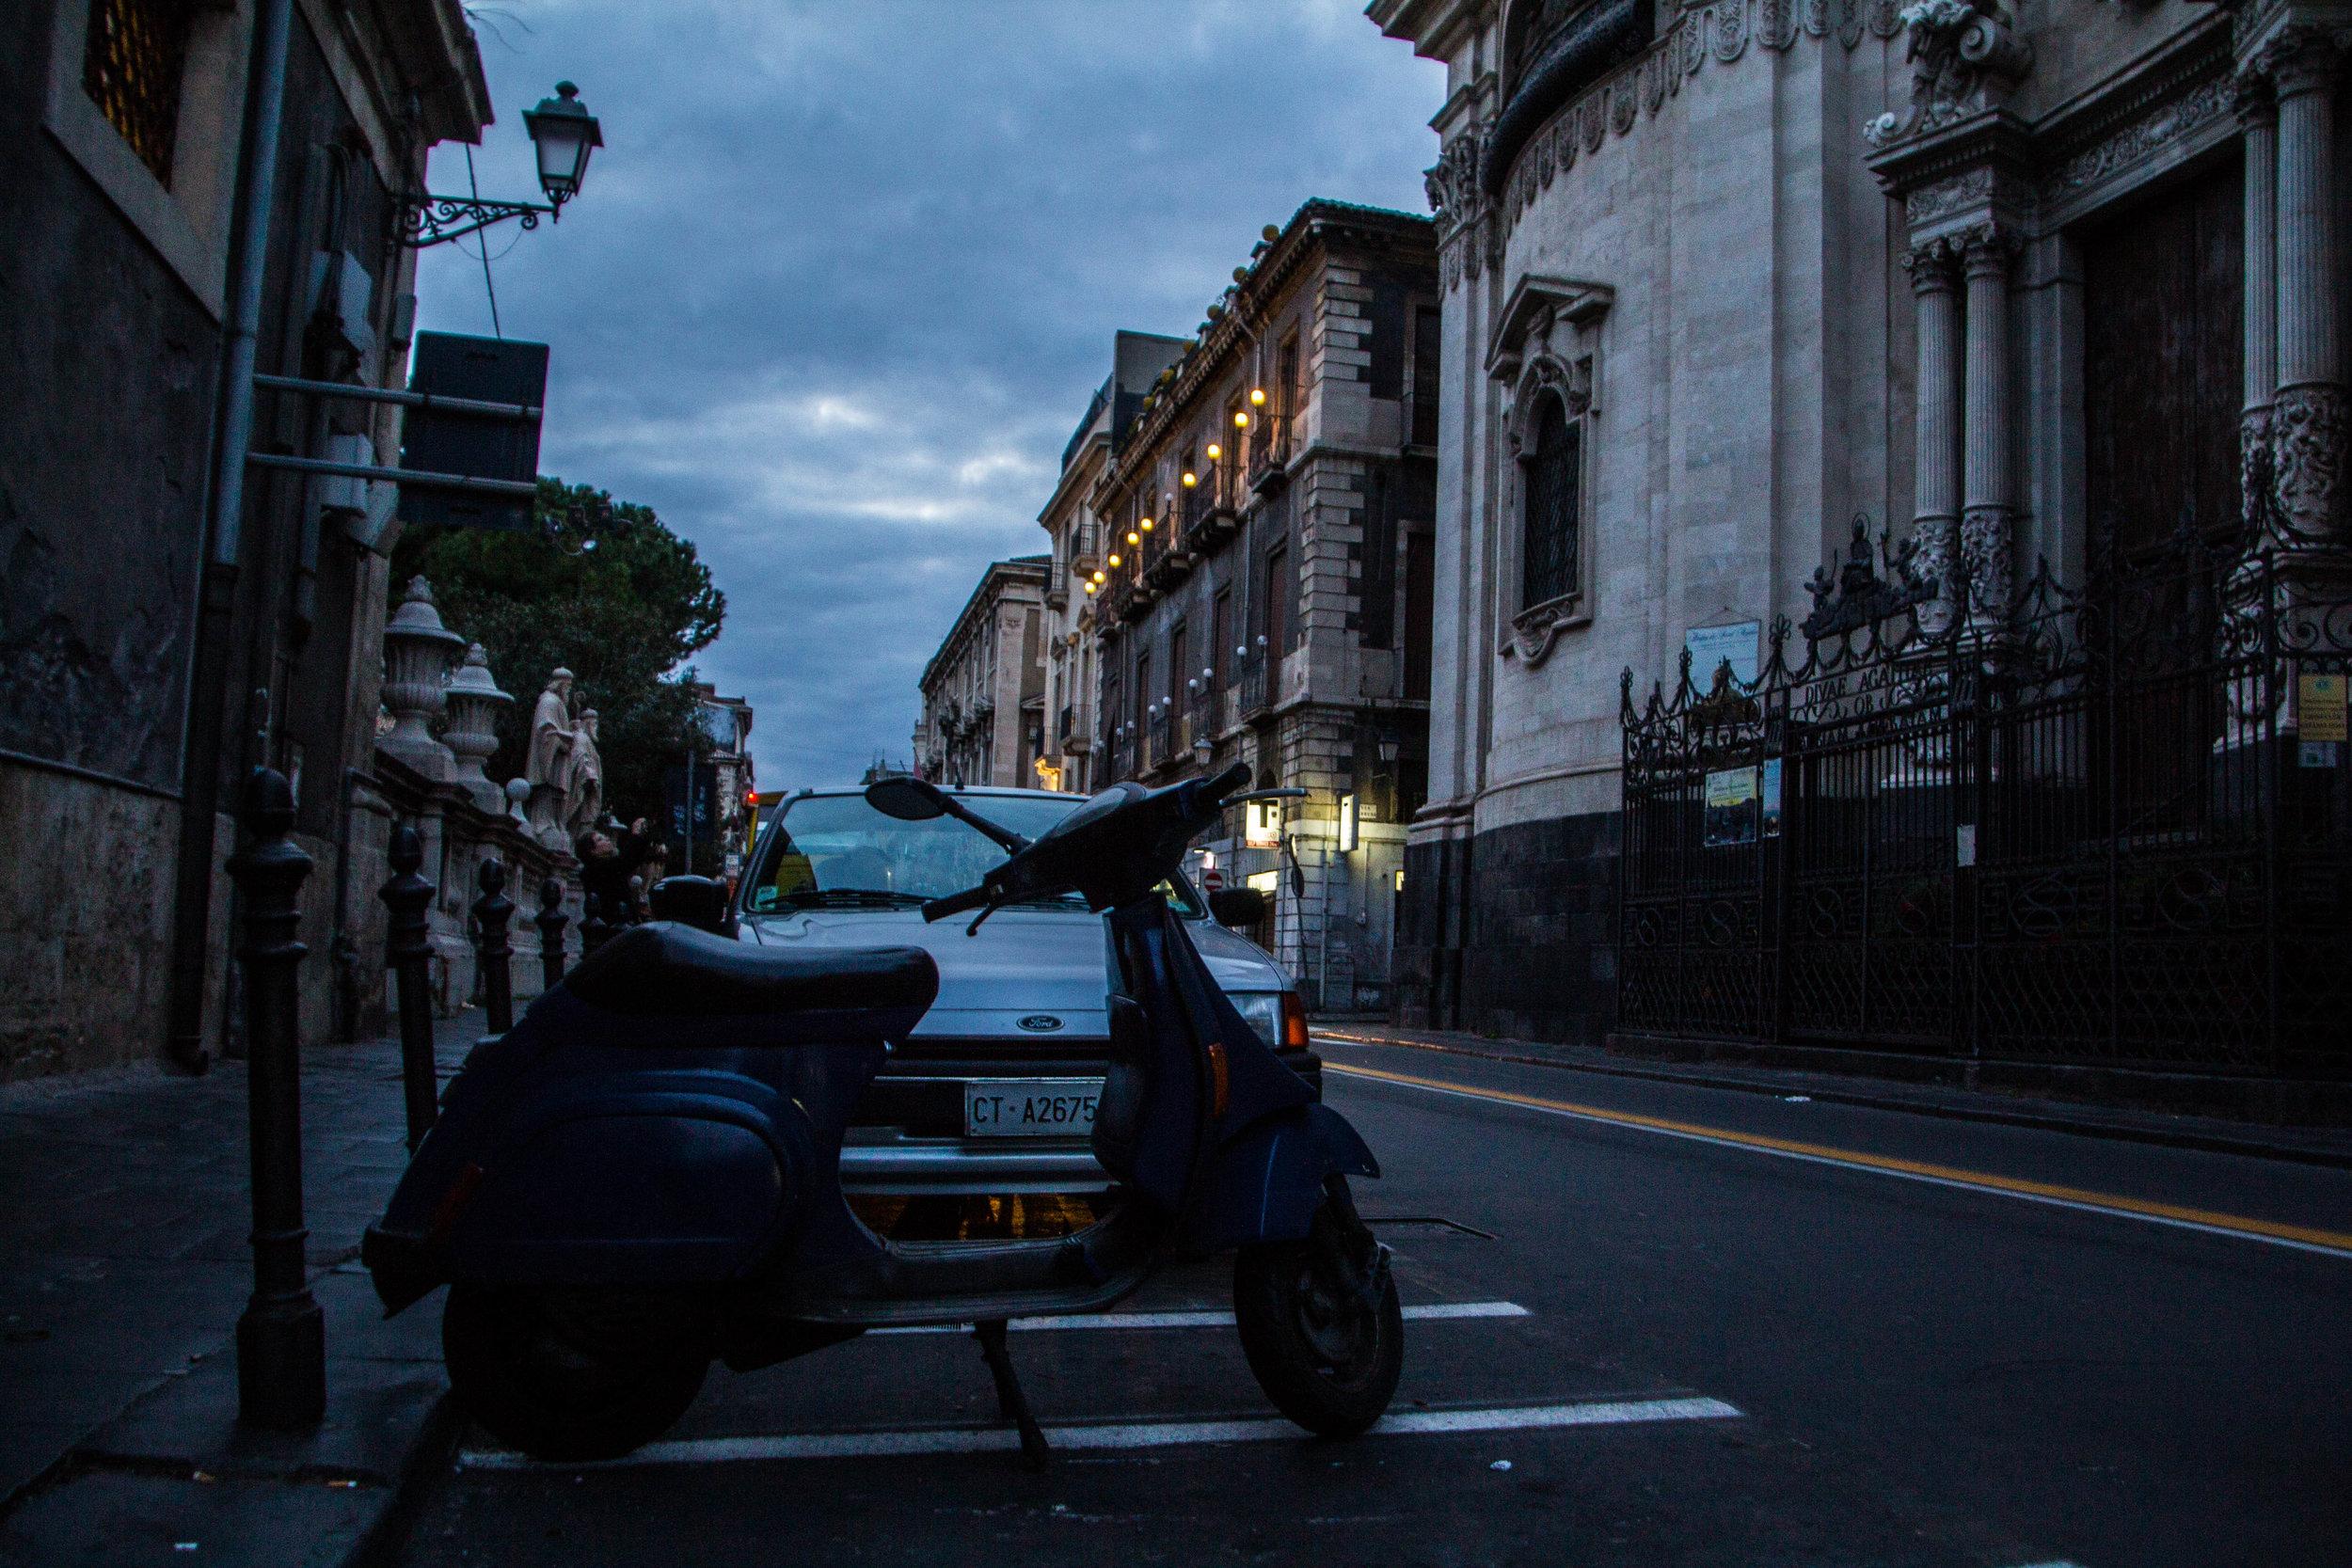 streets-catania-sicily-sicilia-41.jpg